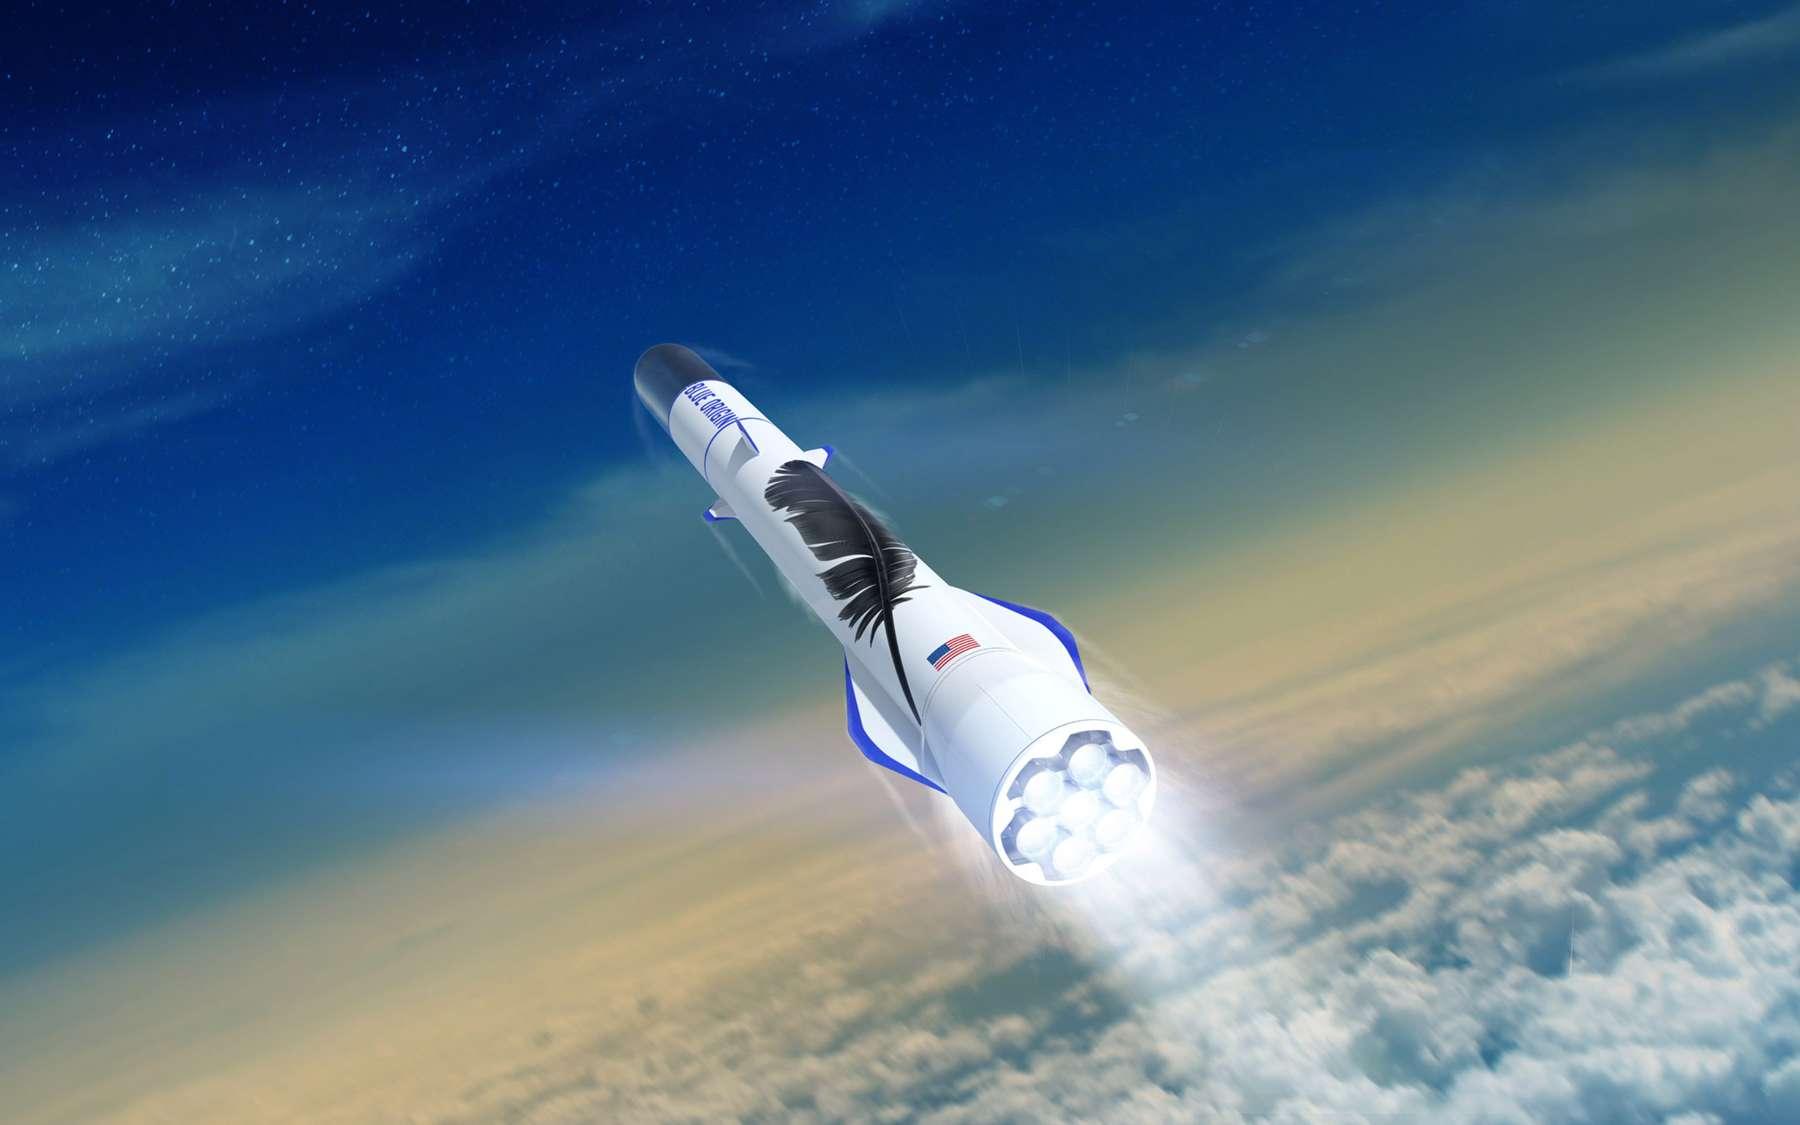 Le futur lanceur New Glenn de Blue Origin. © Blue Origin